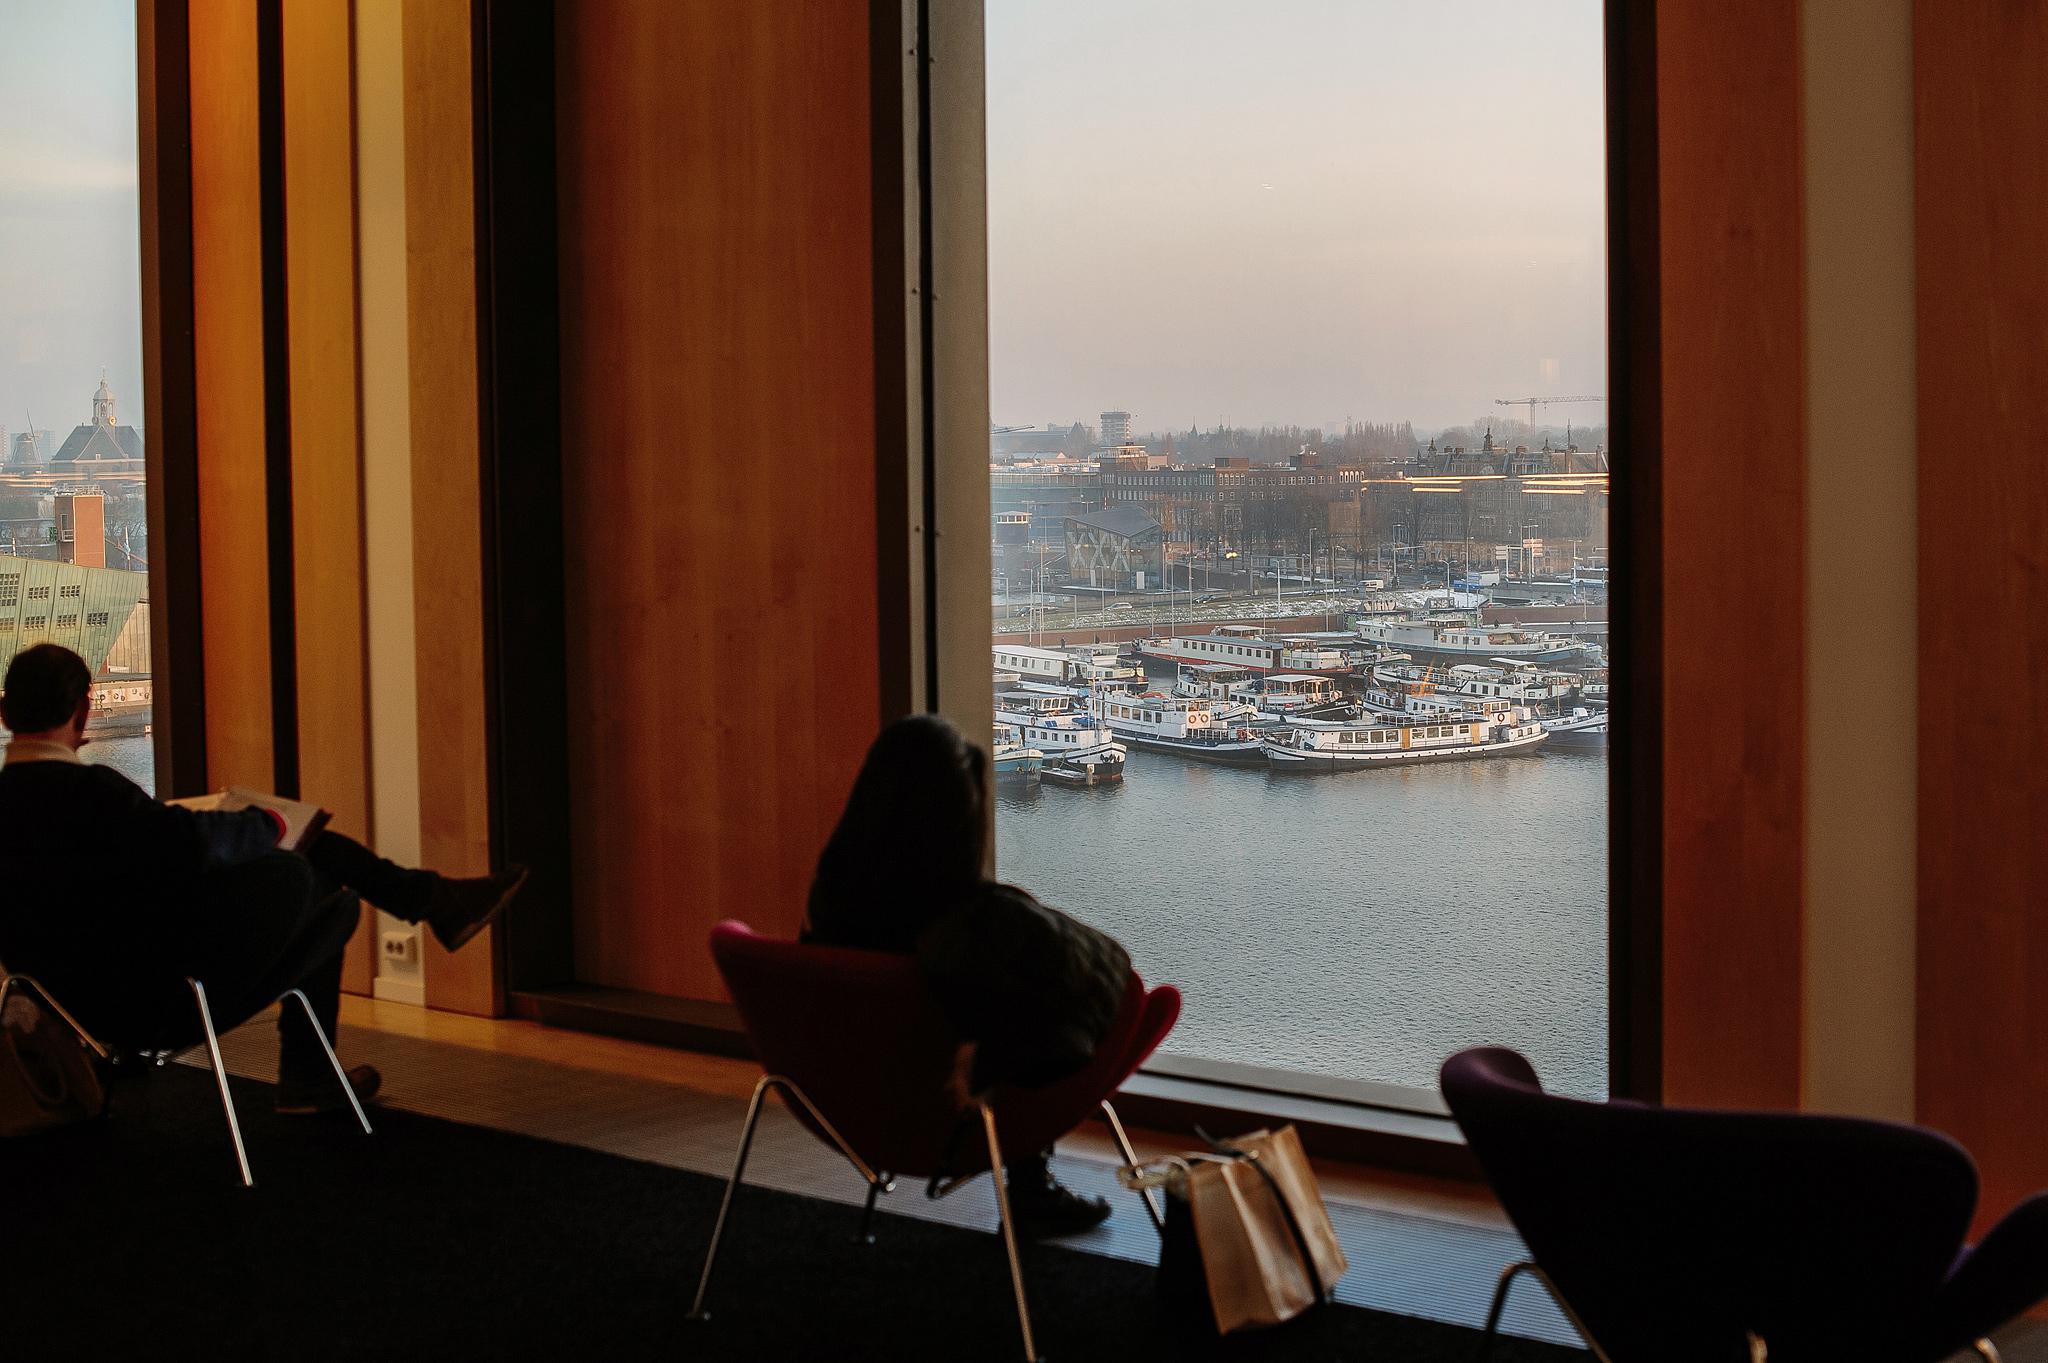 Ла Плас в библиотеке Амстердама, панорамный вид на Амстердам